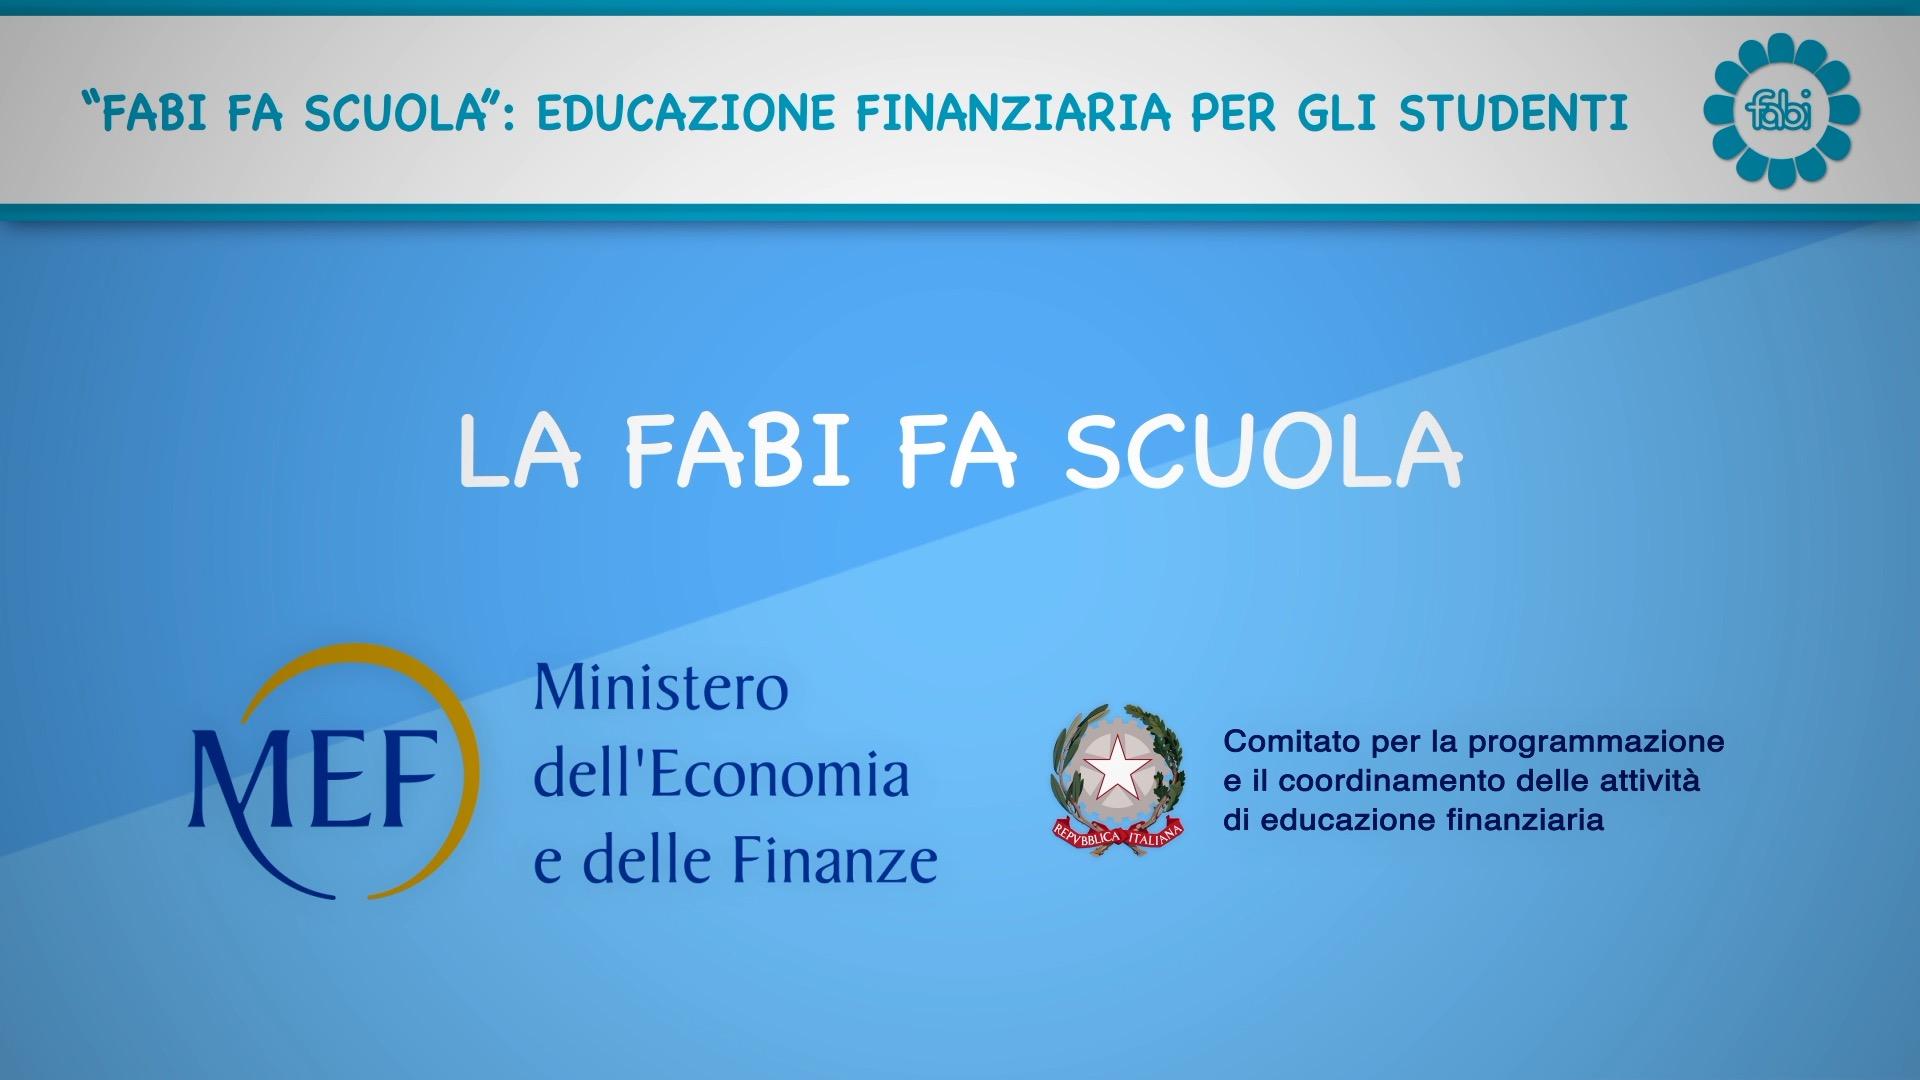 FABI FA SCUOLA, Educazione finanziaria in classe